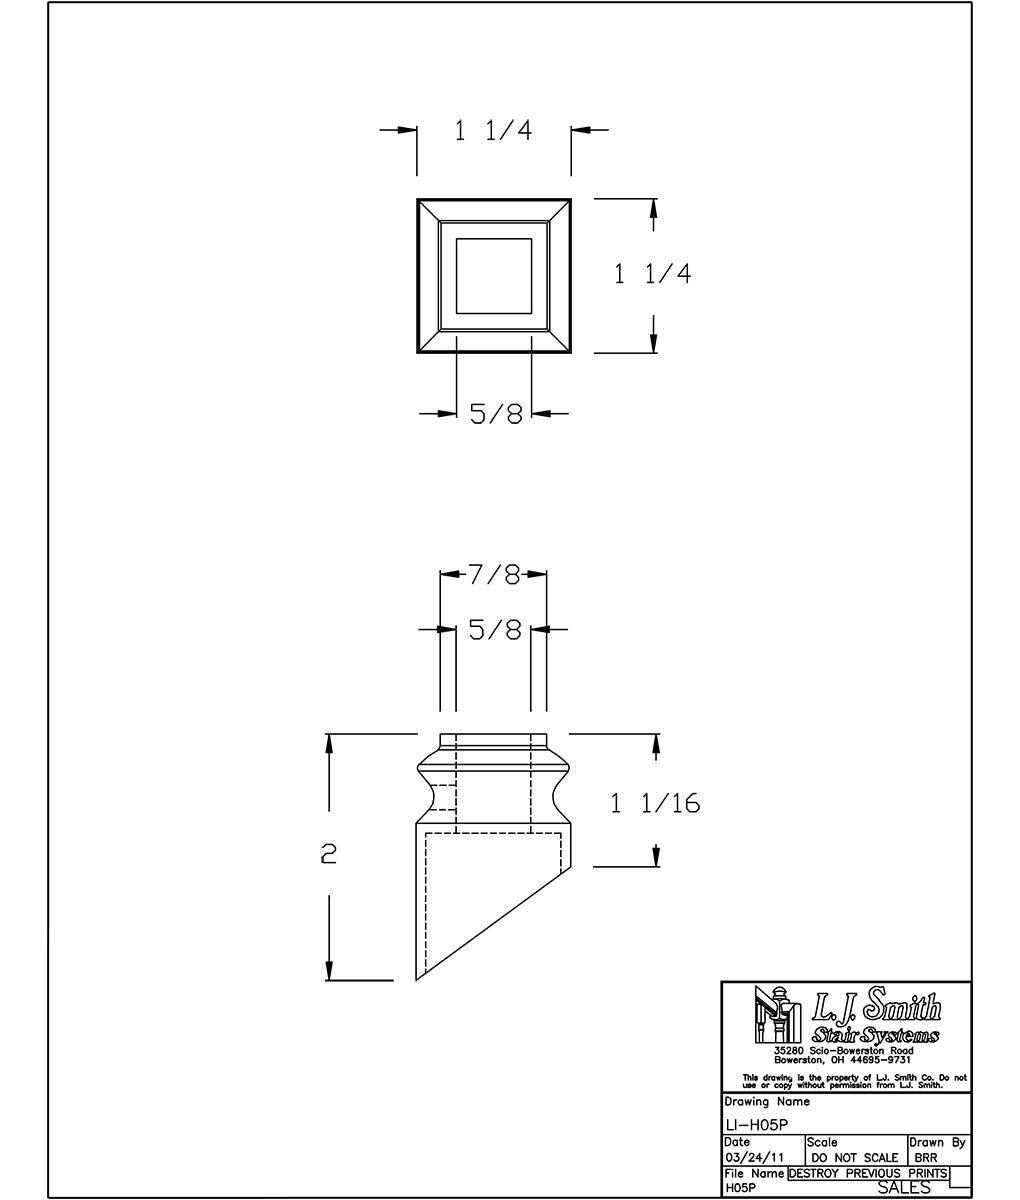 LI-H05P-SB: Iron Pitch Shoe for 9/16'' Solid Square Iron Balusters (Satin Black)